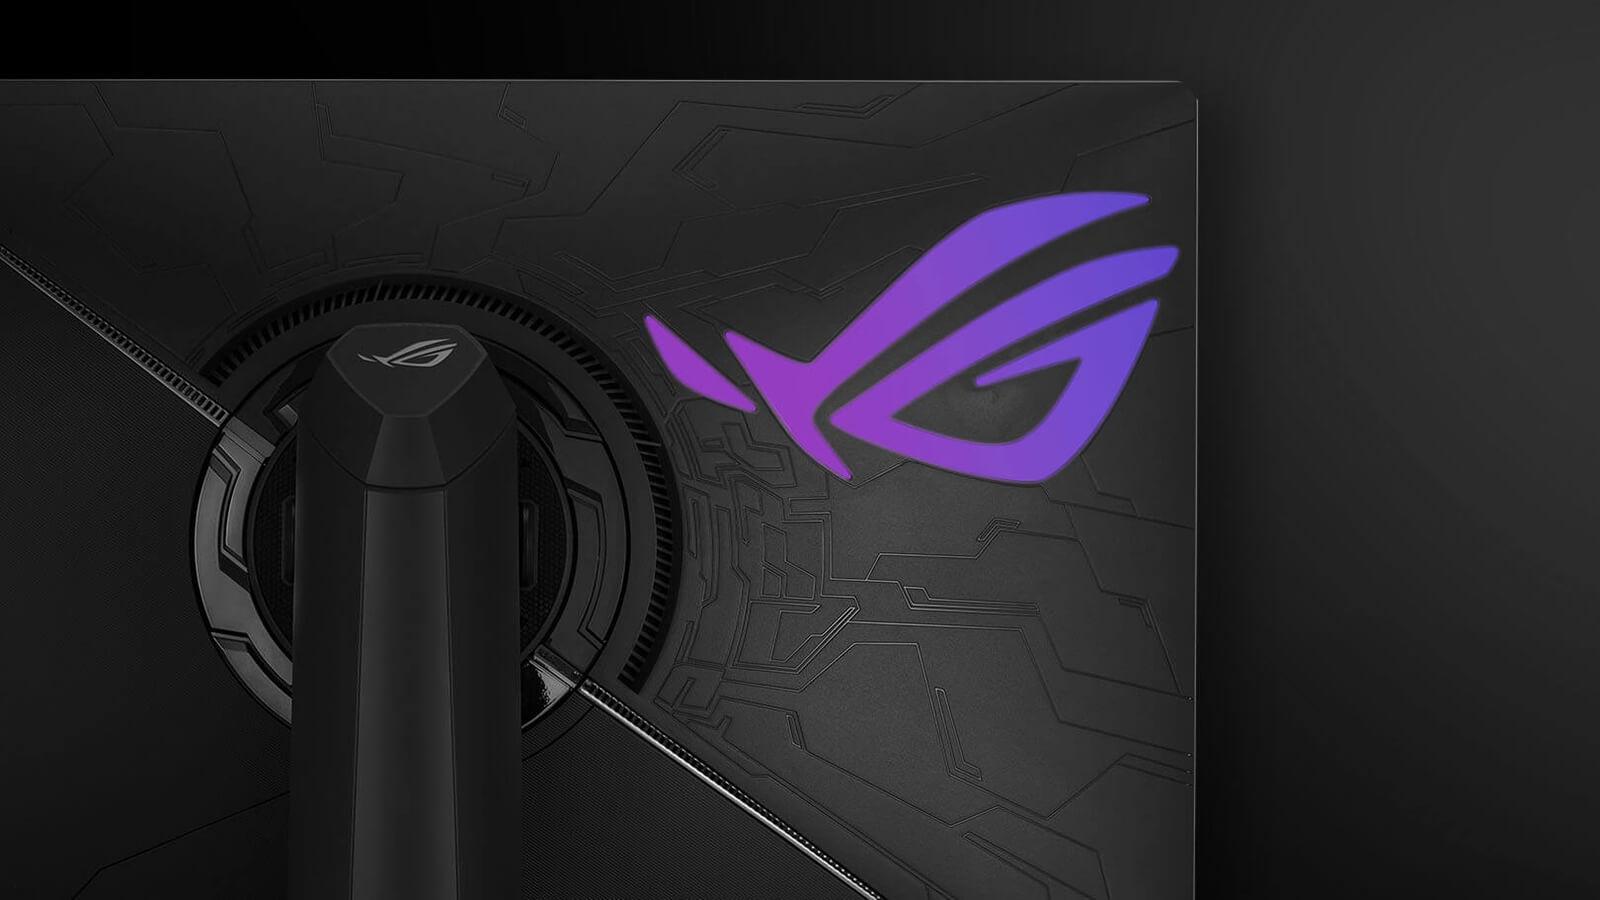 Asus Rog Strixxg27uq Gaming Monitor – Features 14